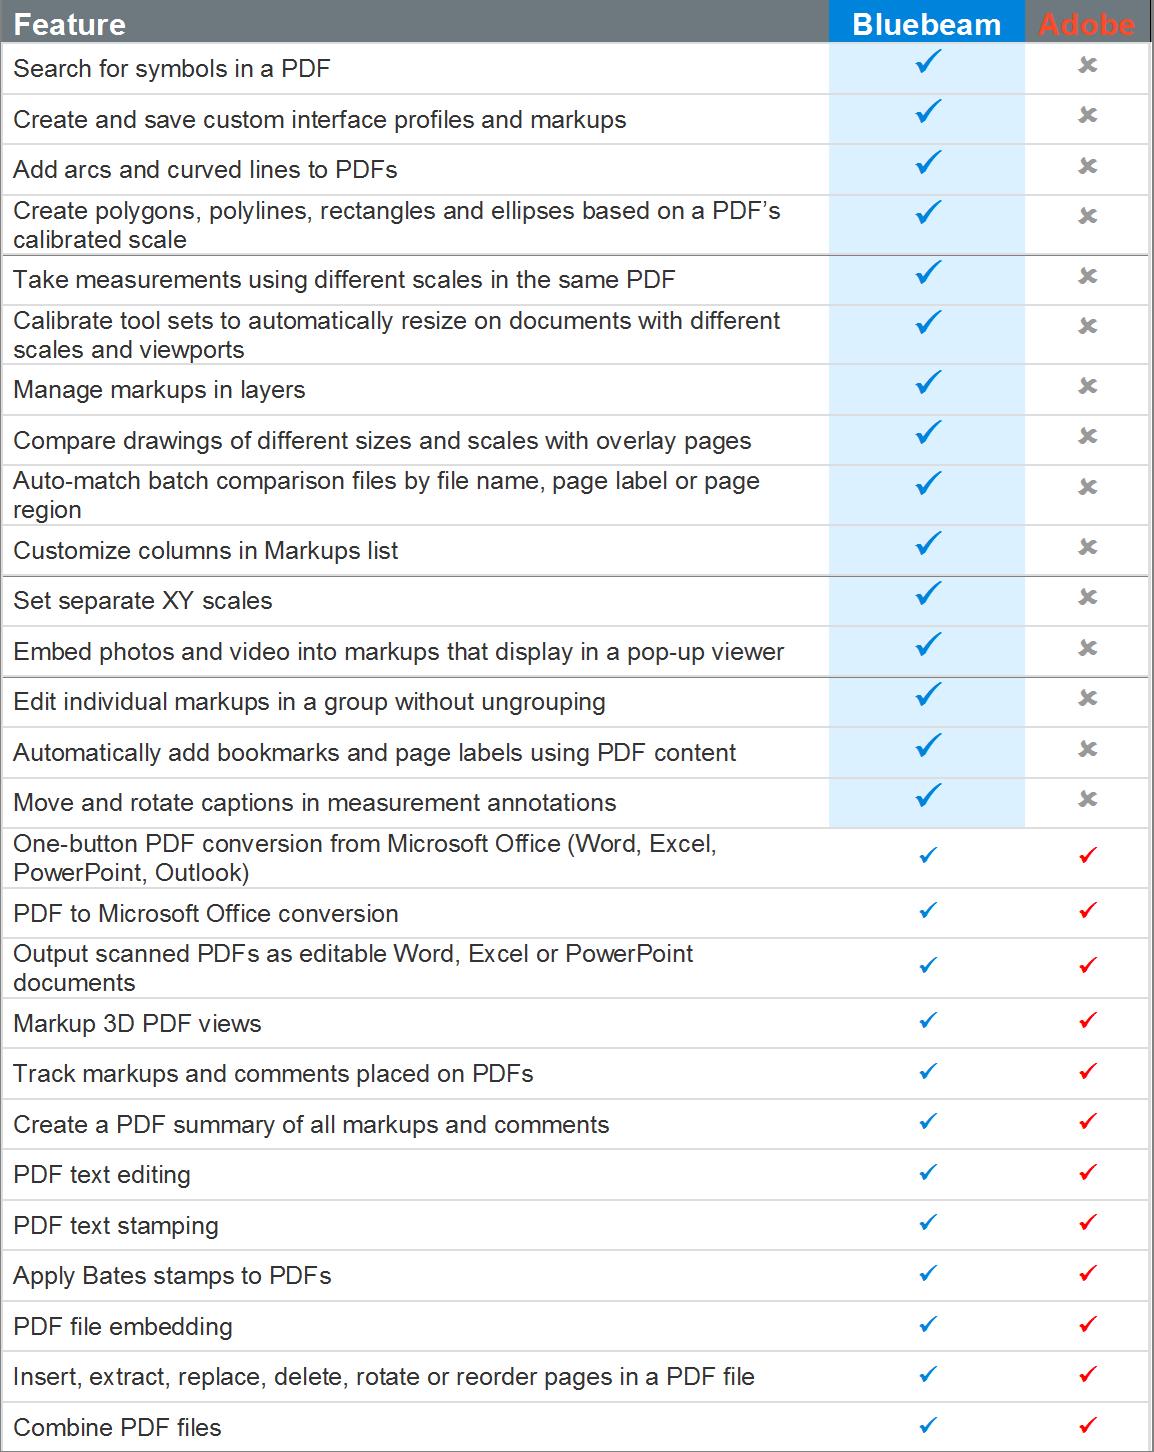 bluebeam tutorials 2018 pdf